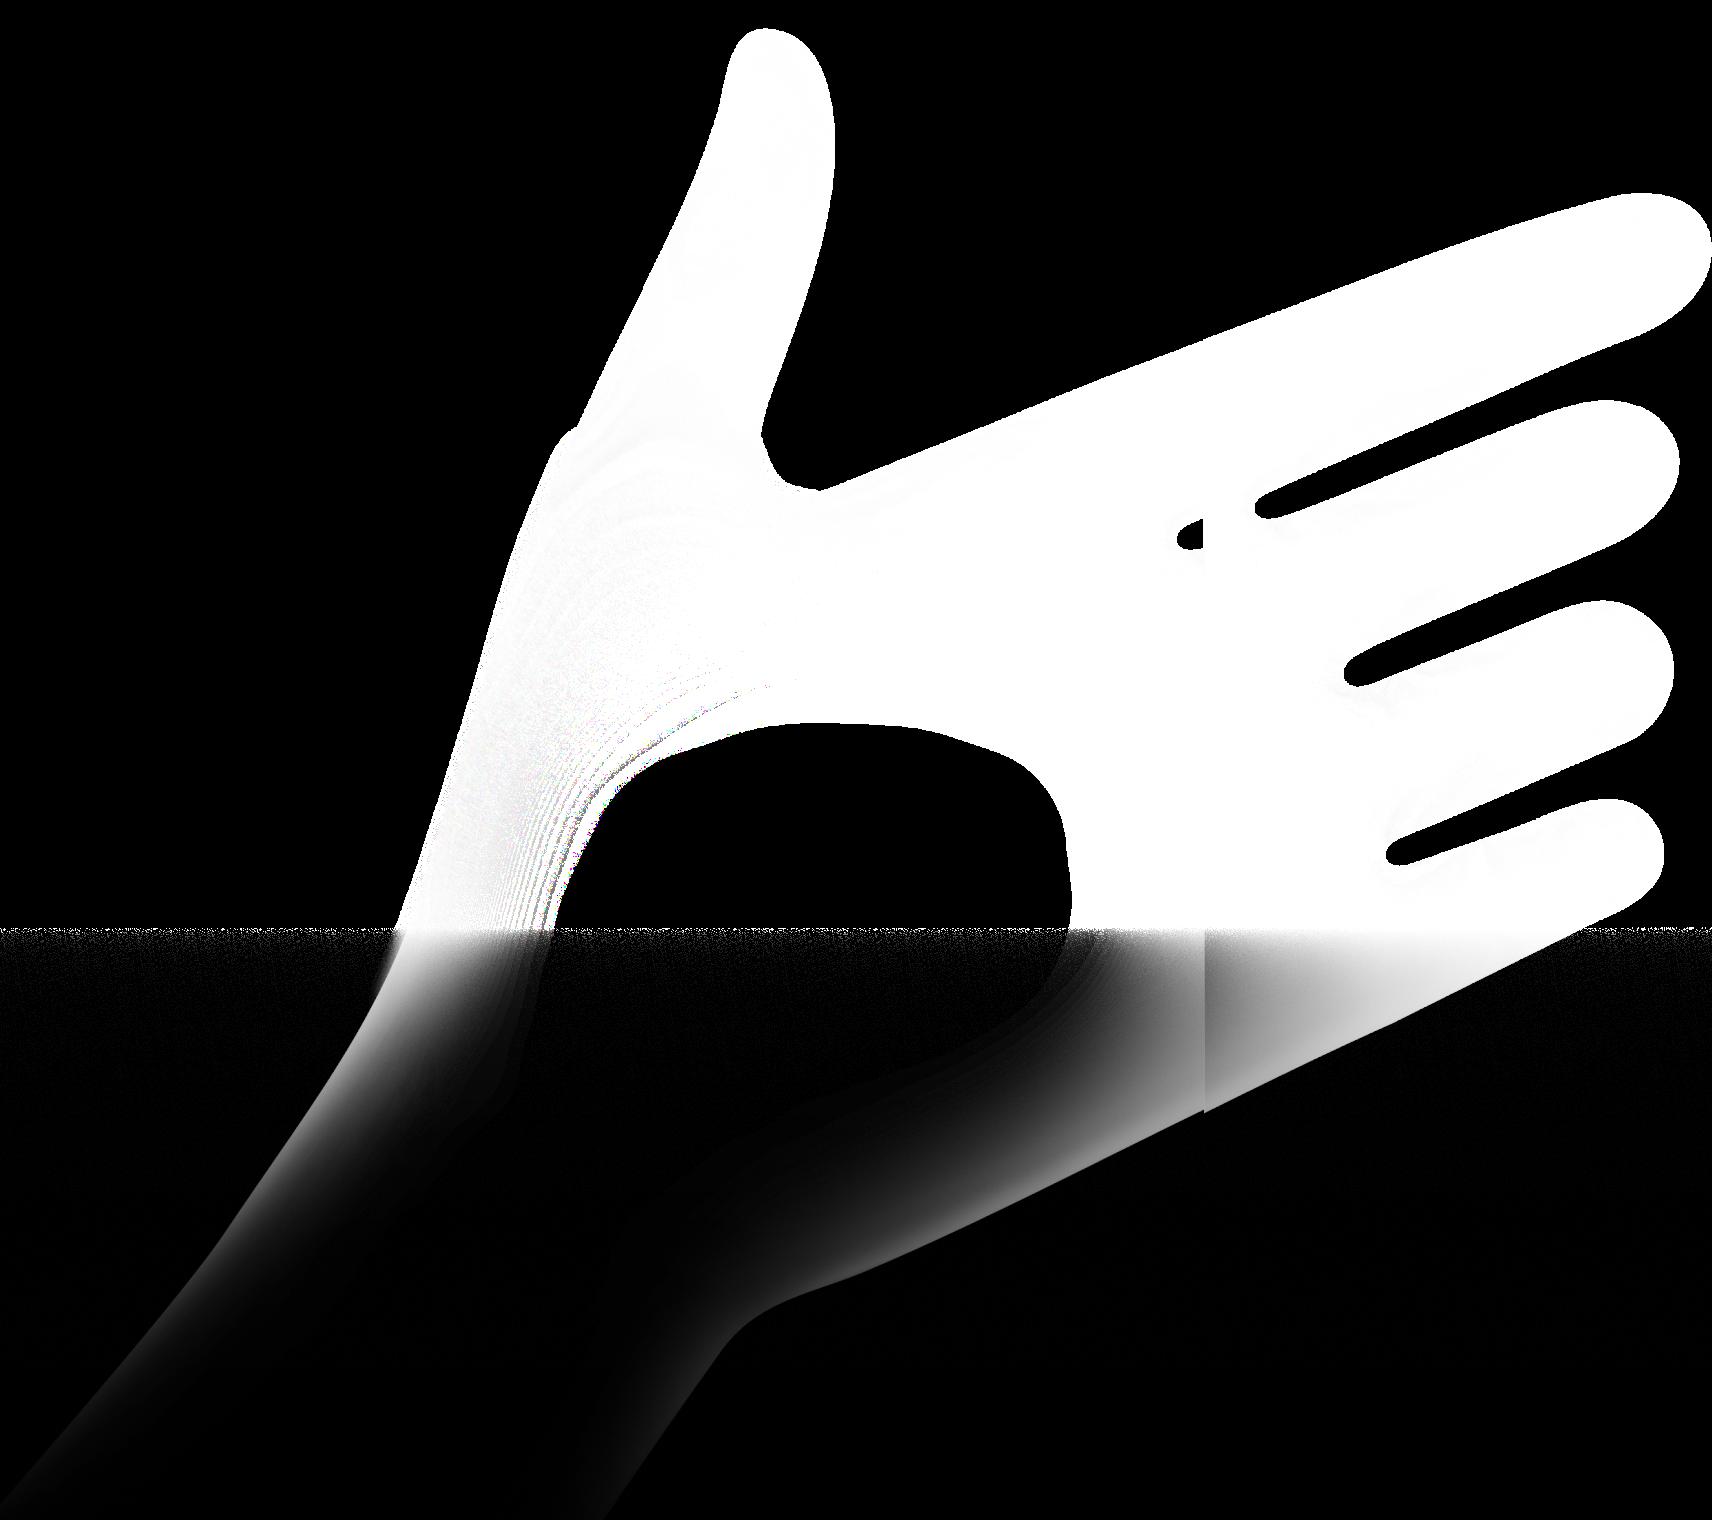 phone-holding-hand